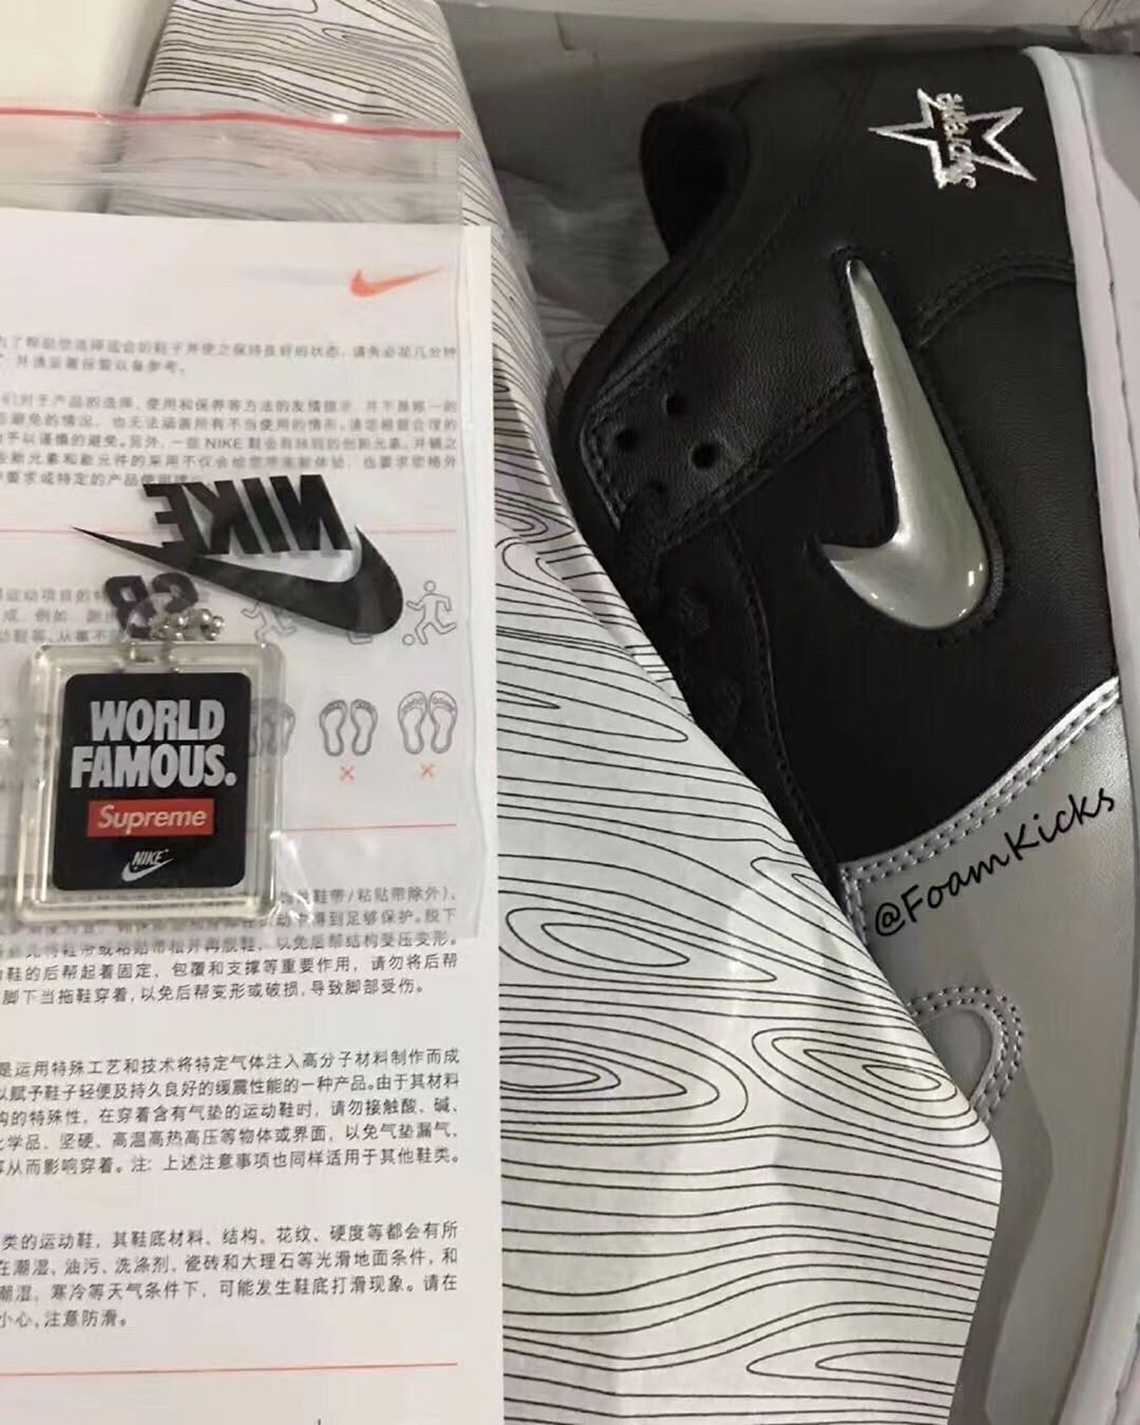 best website 8064b 134a5 Supreme Nike SB Dunk Low Release Info CK3480-001 CK3480-600 ...